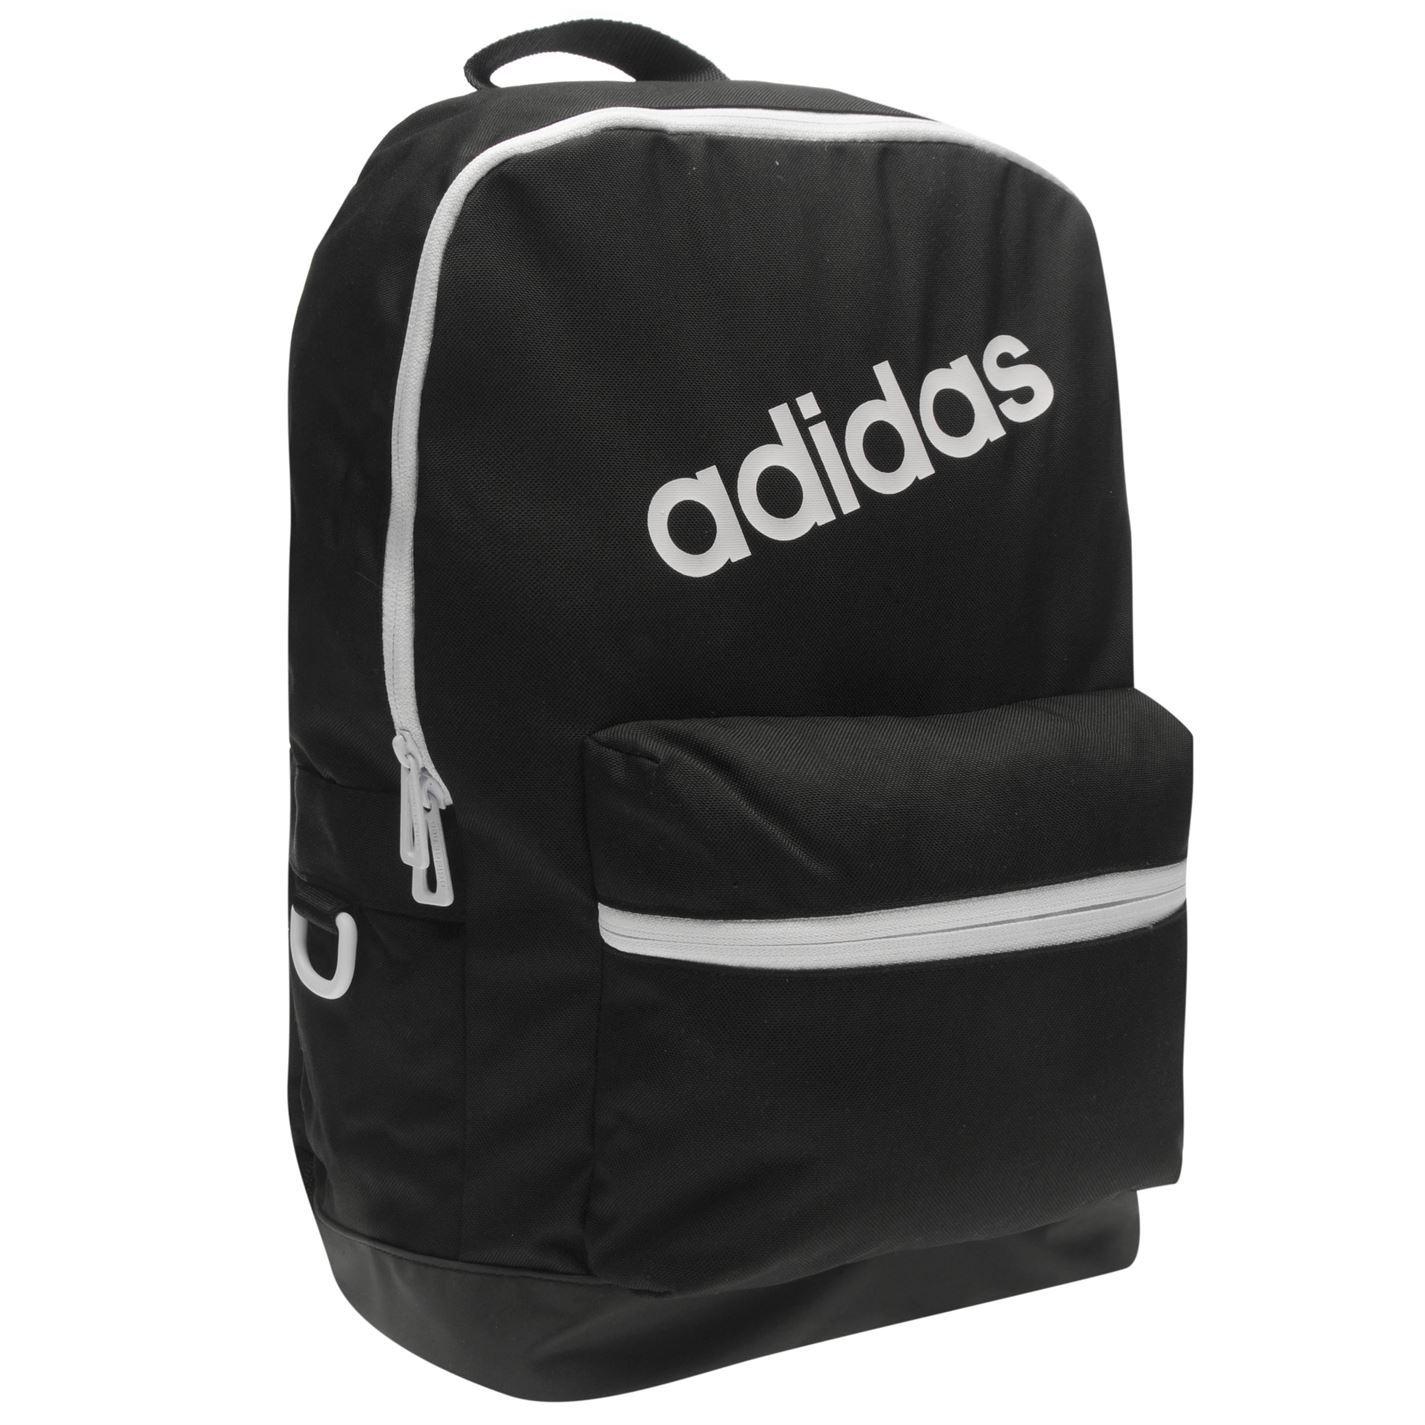 95f2e83812dbd adidas-Unisex-Daily-Backpack-Back-Pack-Zip thumbnail 2